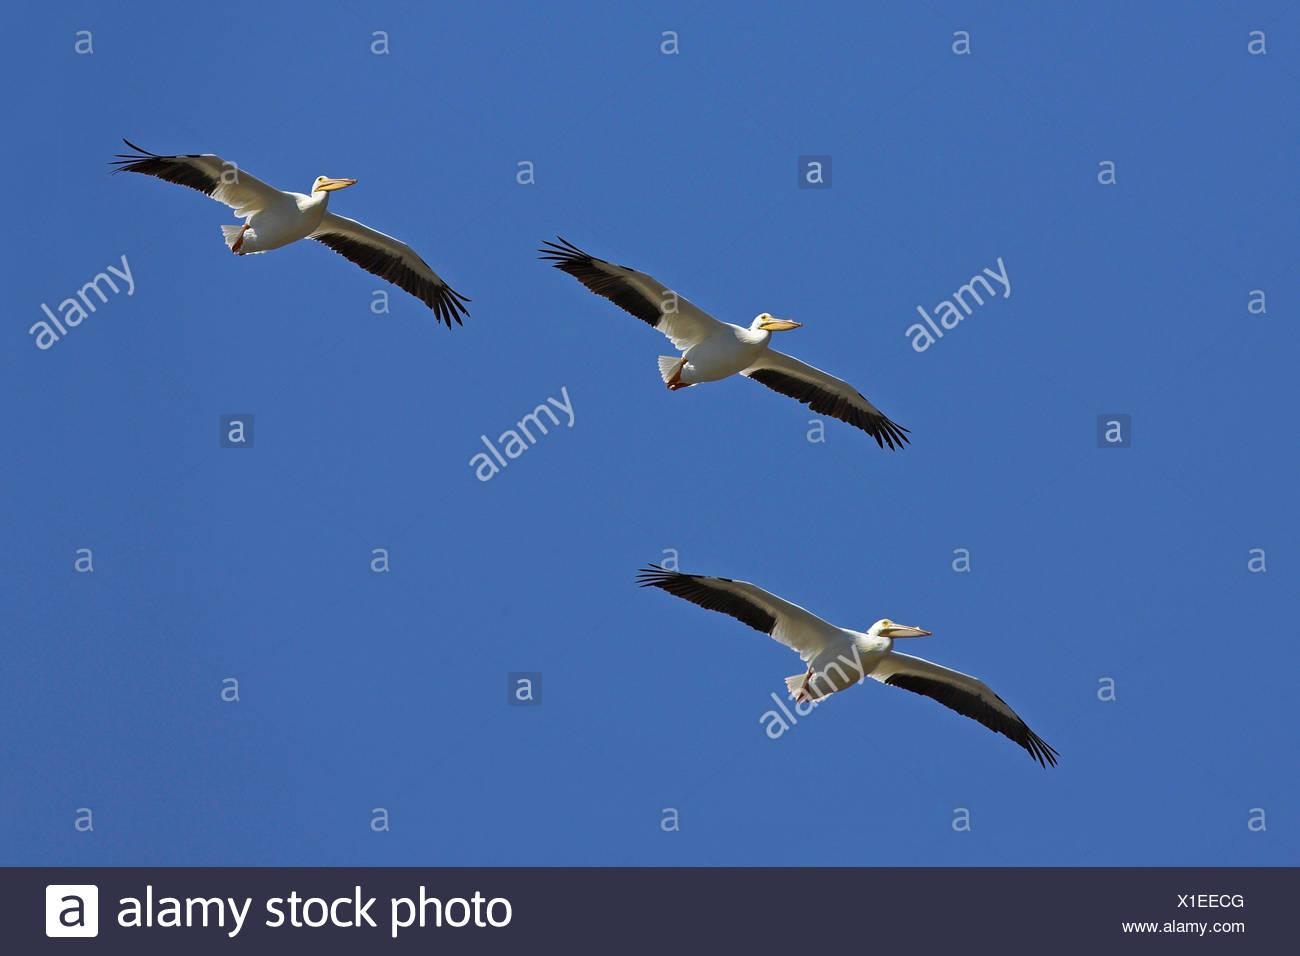 American white pelican (Pelecanus erythrorhynchos), flying troop, USA, Florida, Sanibel Island Stock Photo